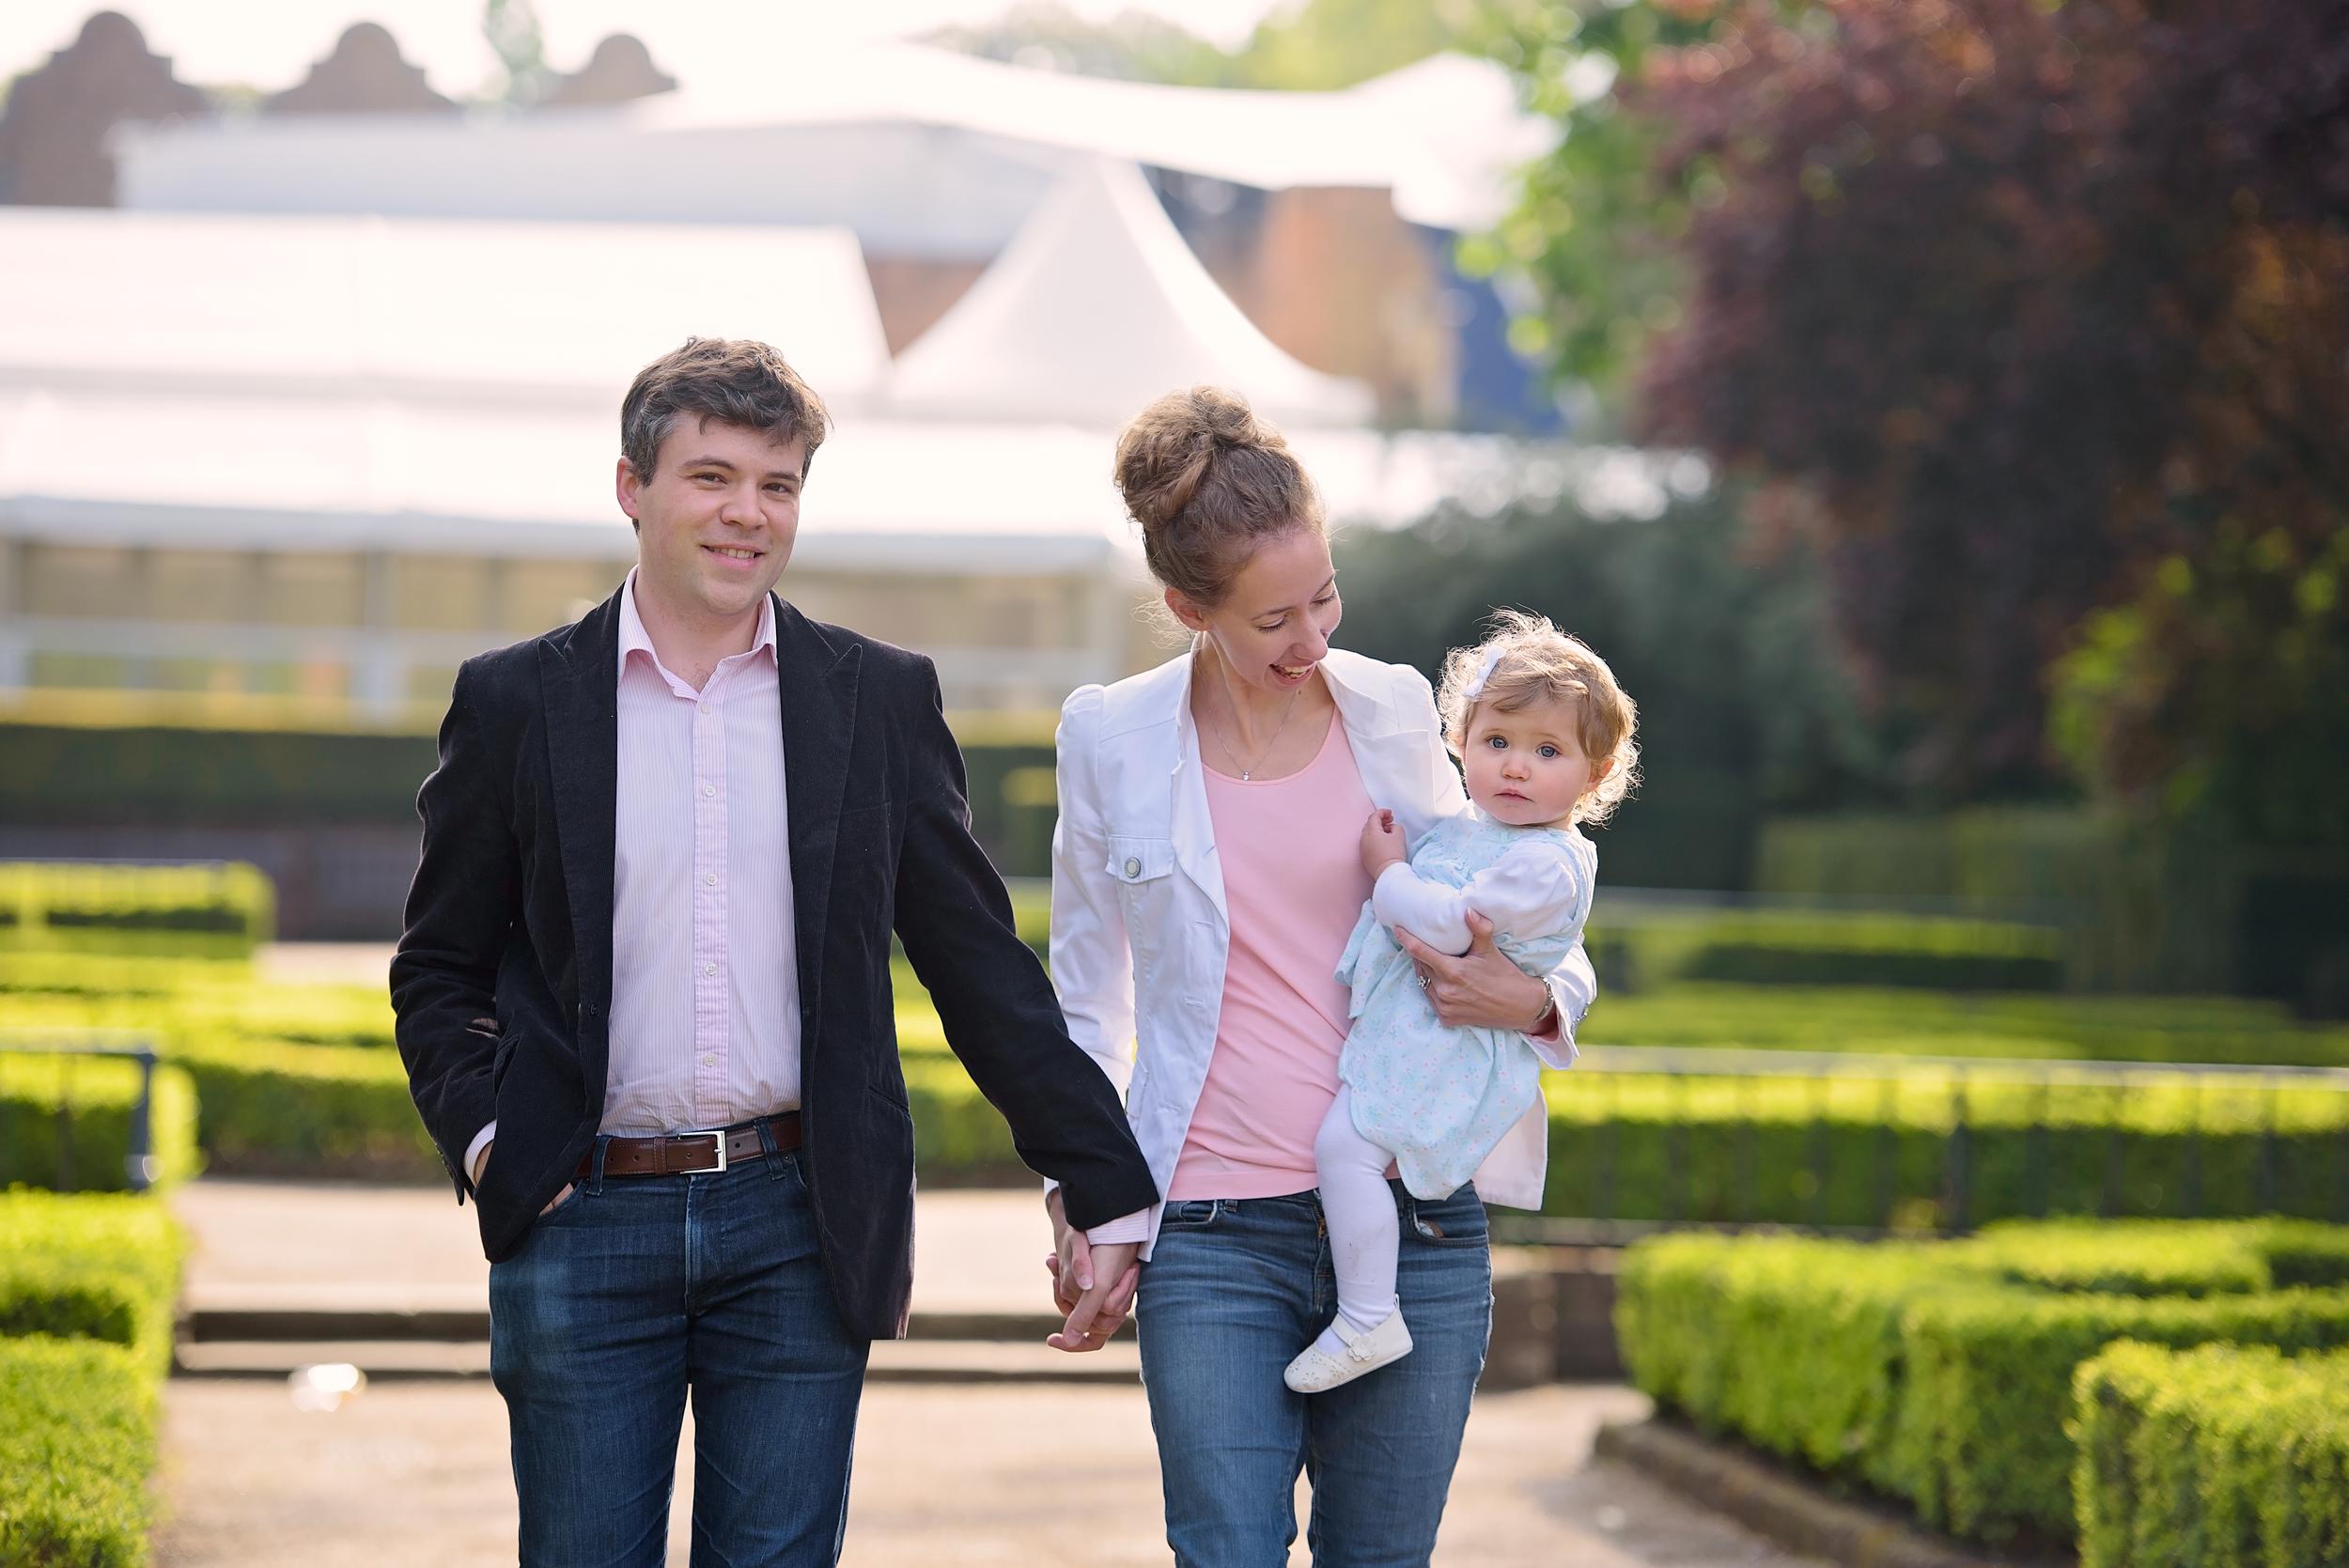 Holland Park family photoshoot